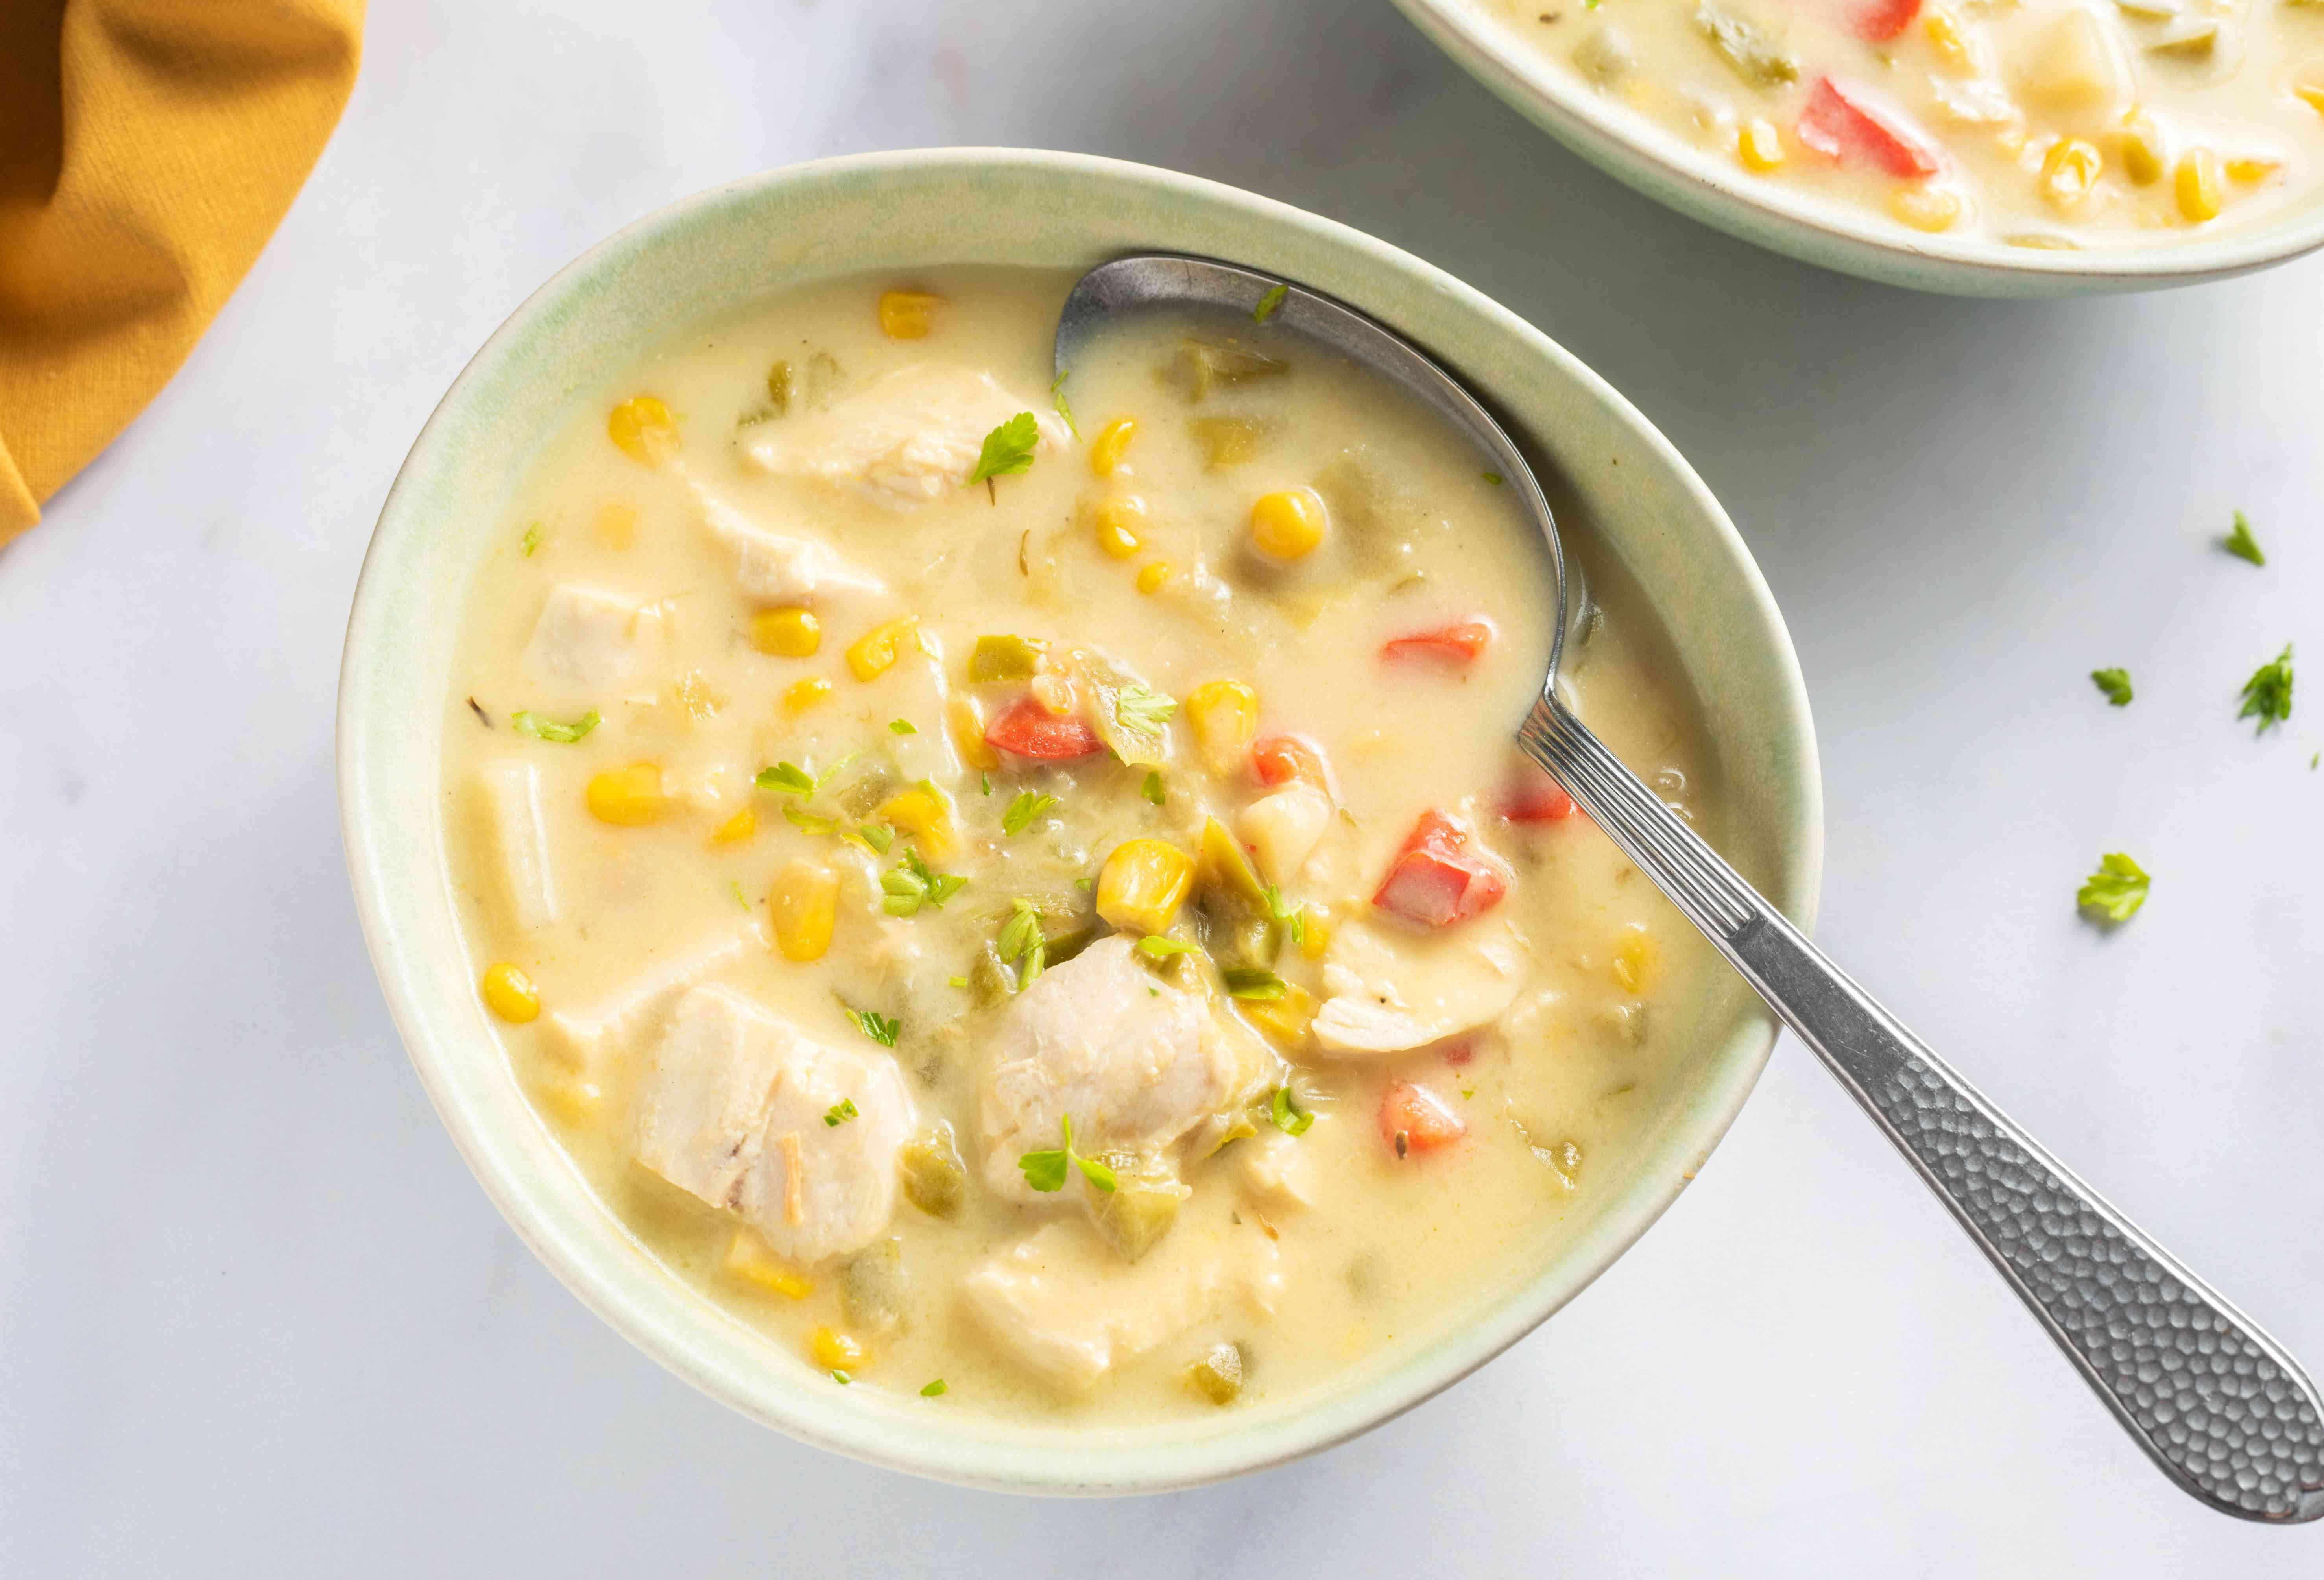 Crock pot chicken and corn chowder